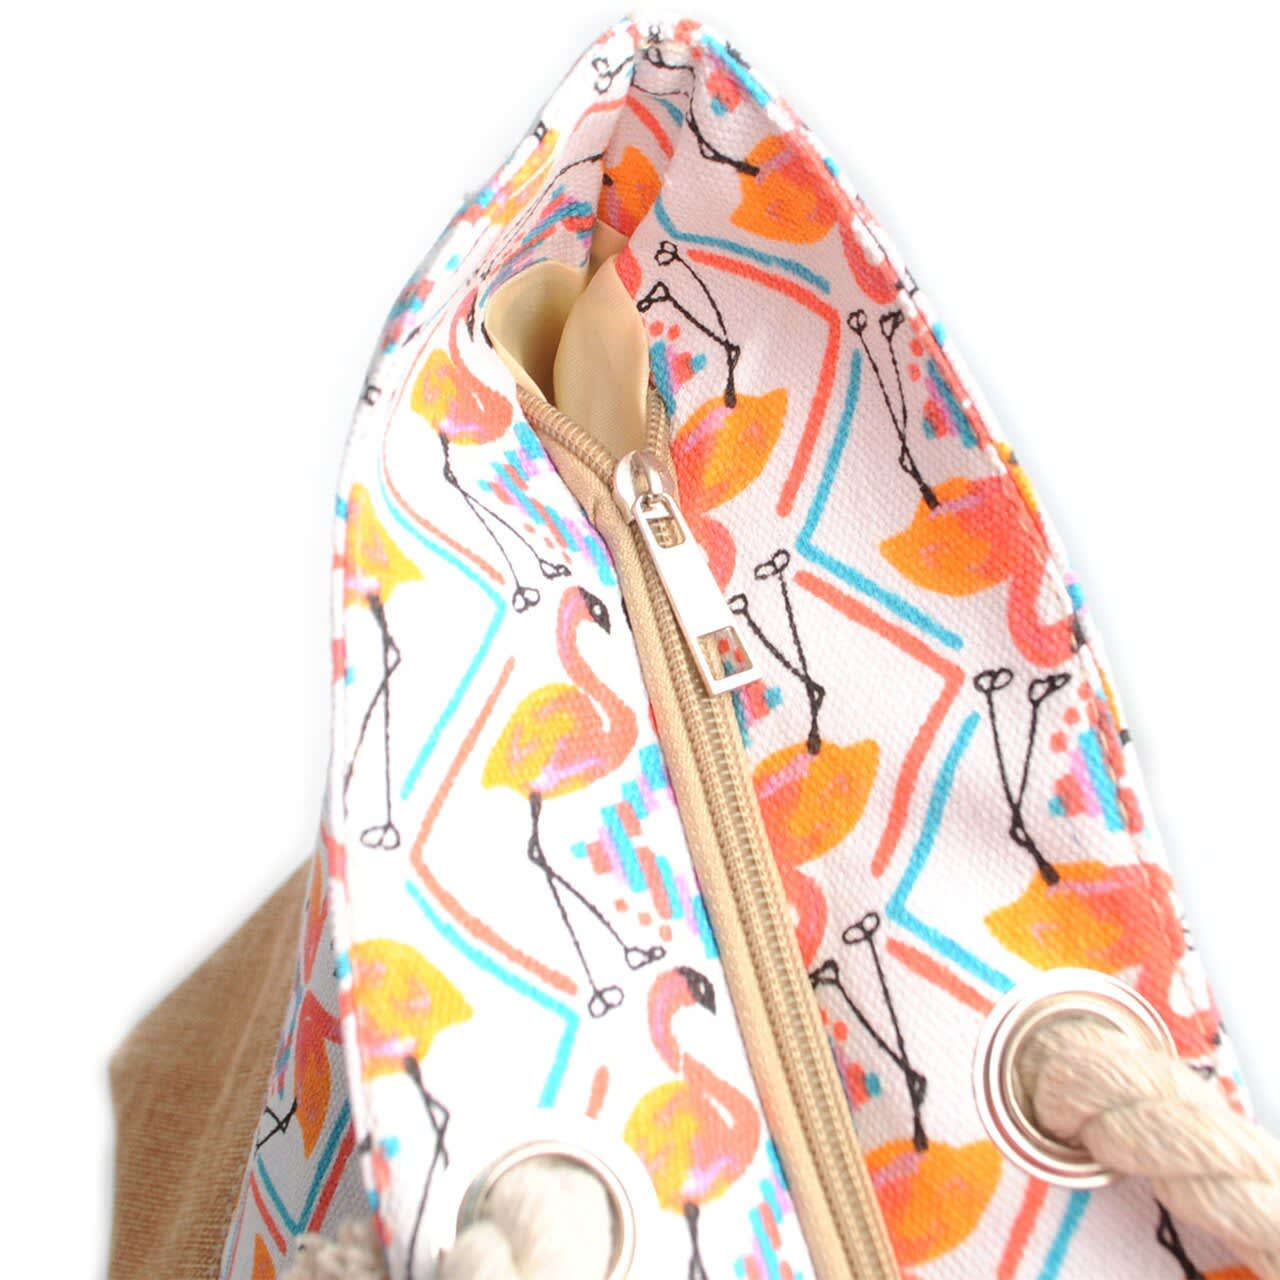 Flamingo Tote Beach Bag - Light Beige - Detail